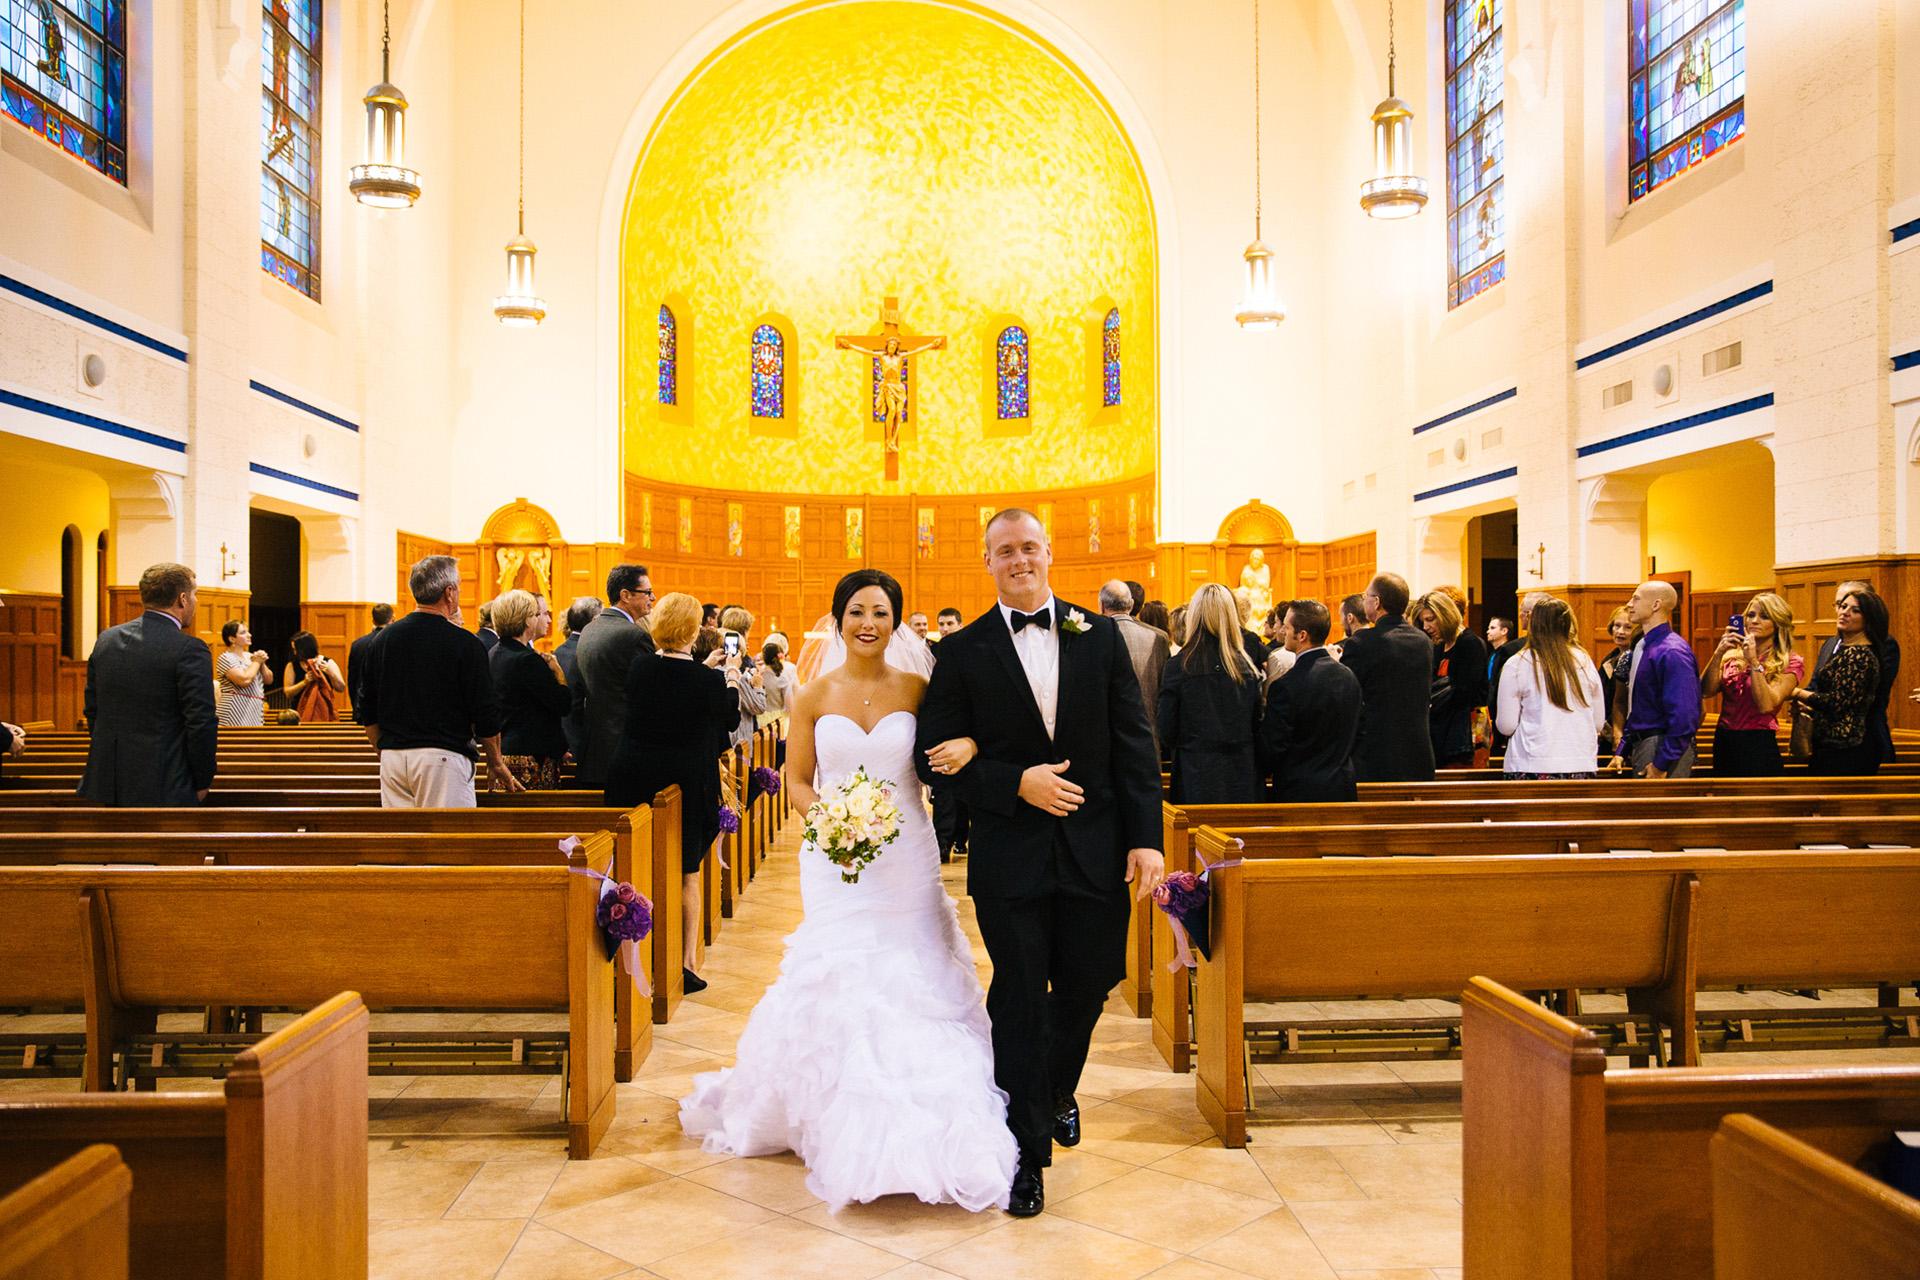 Cleveland Wedding Photographer St Christopher's Church Red Tail Golf Club 10.jpg